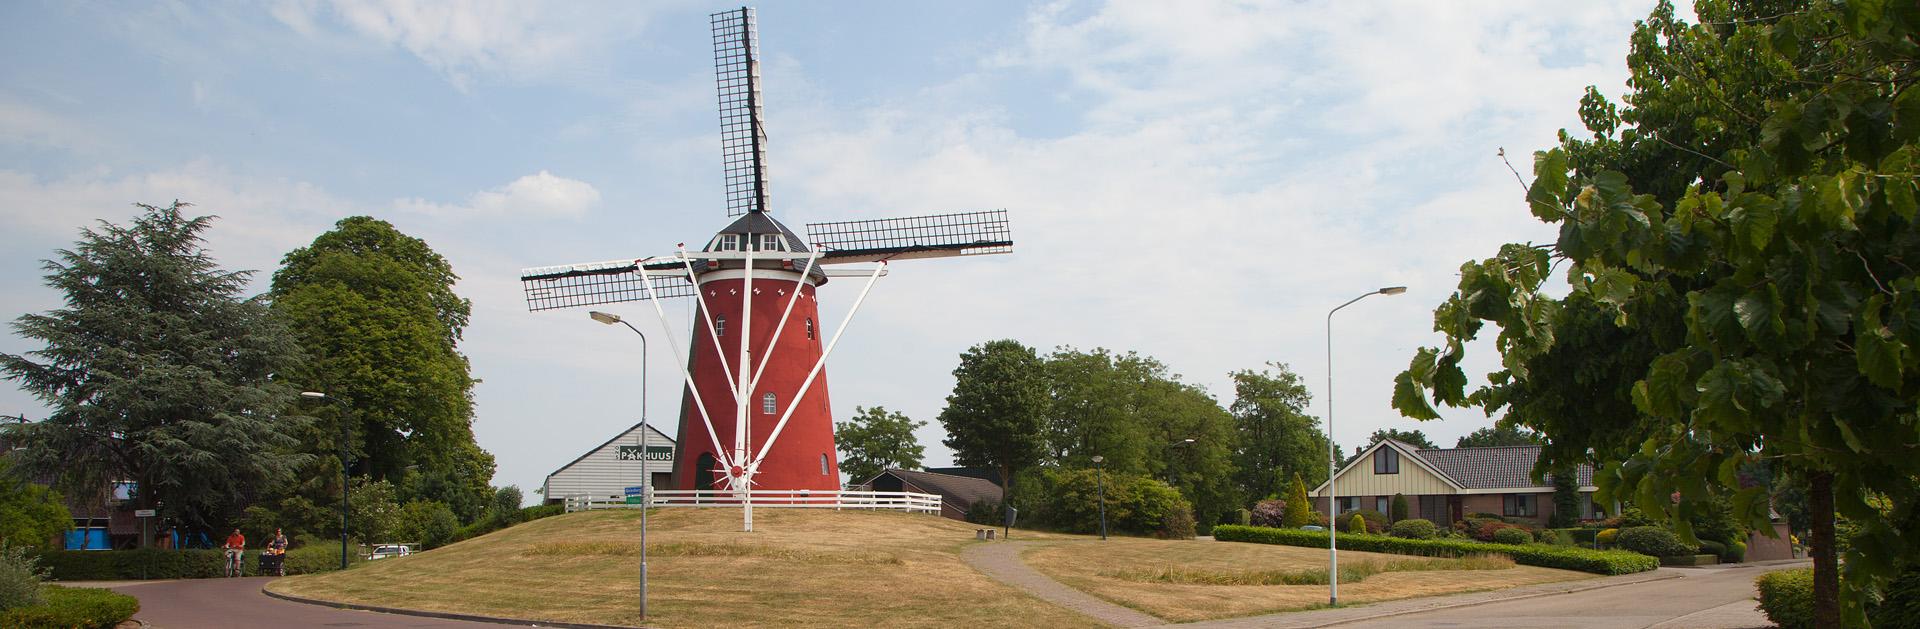 Gerritsens Molen - Silvolde